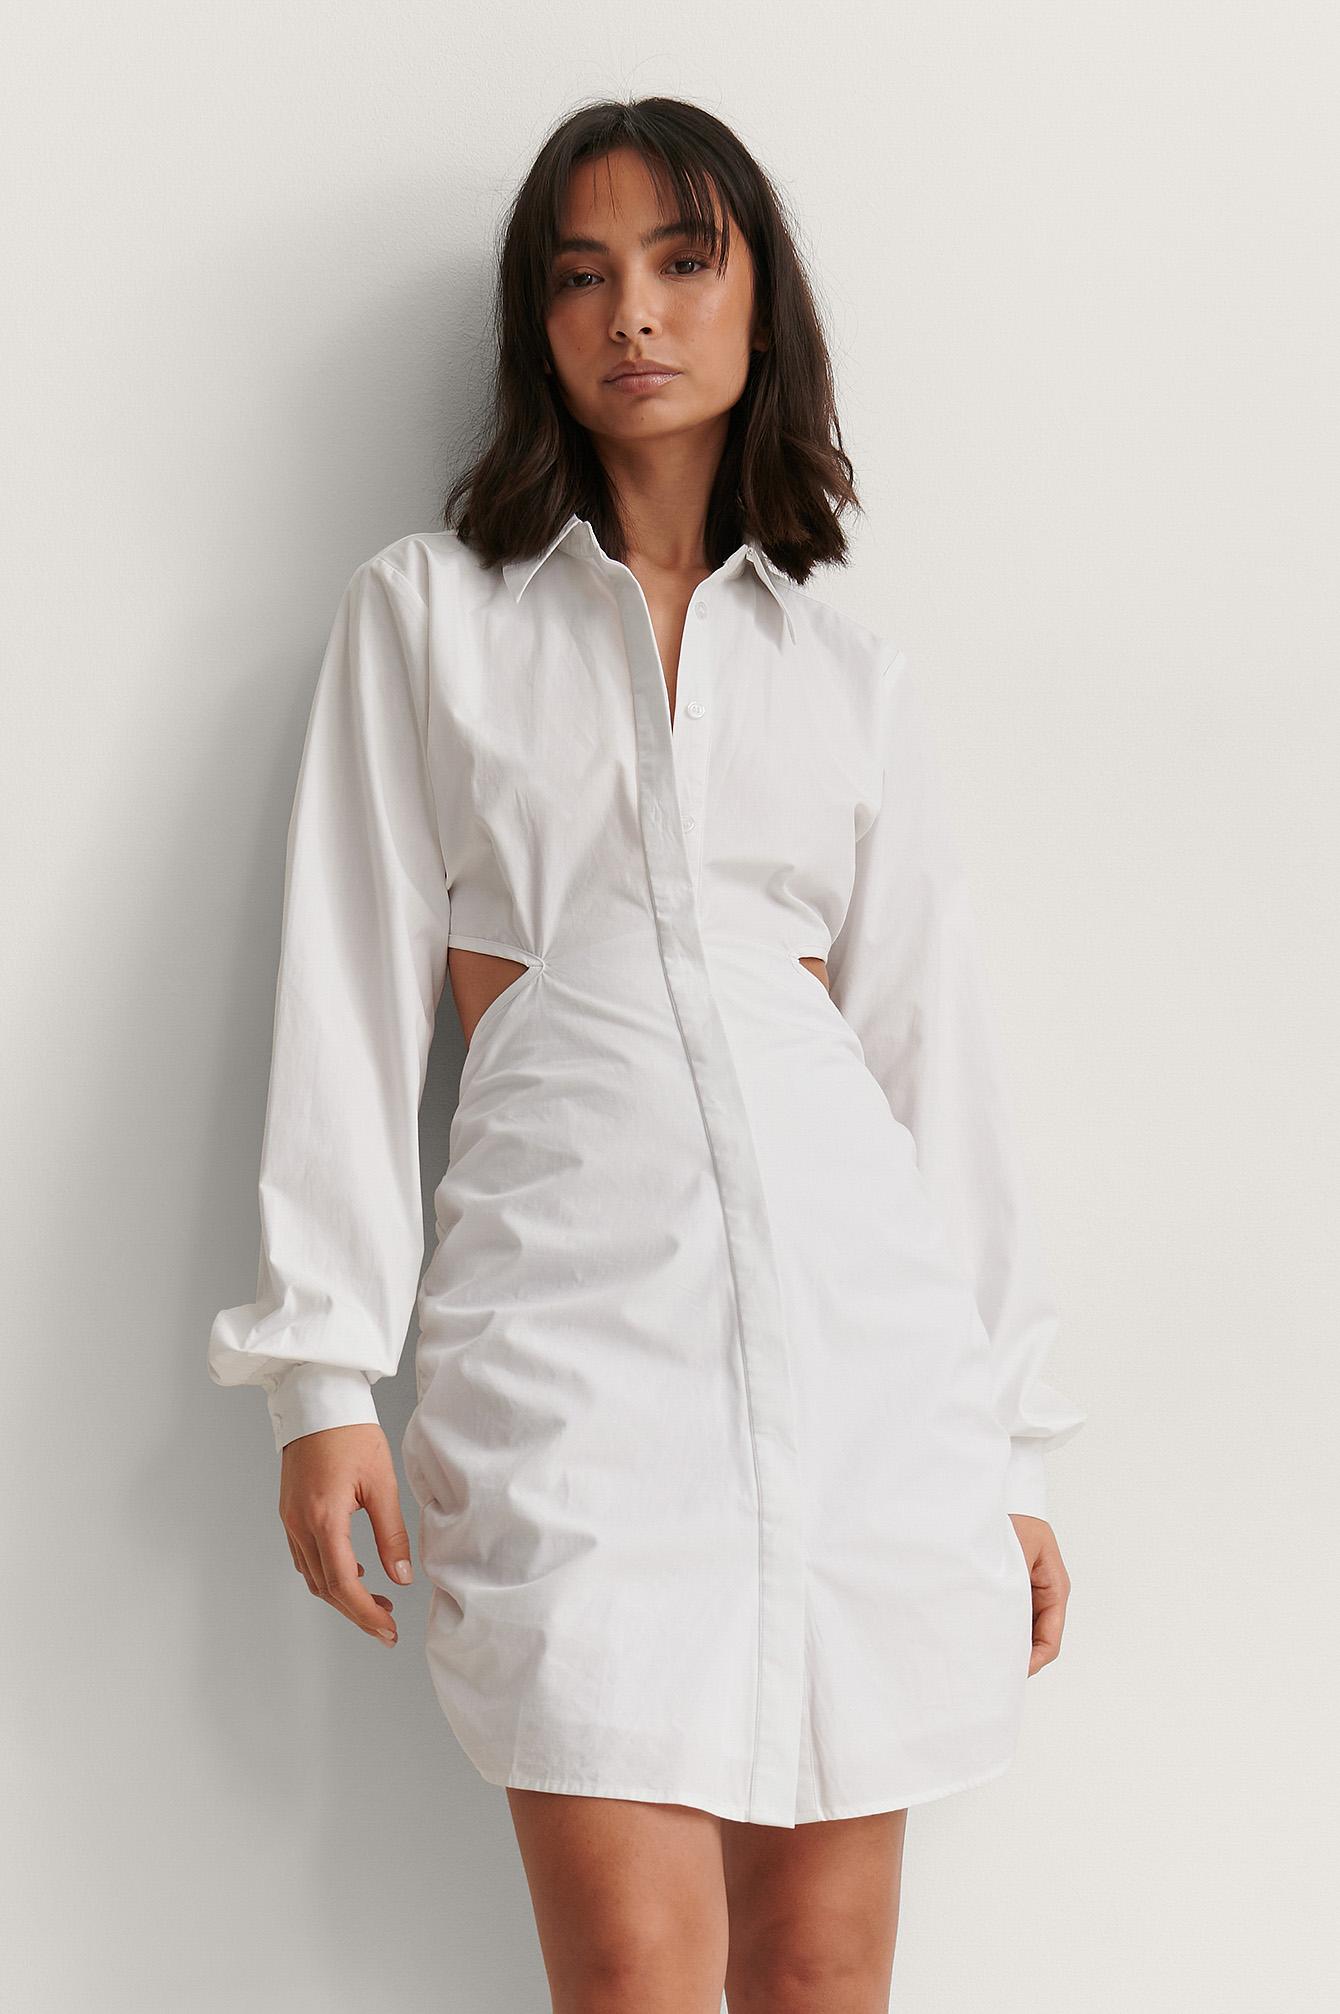 na-kd trend -  Organisch HemdkleidOrganisch Hemdkleid - White